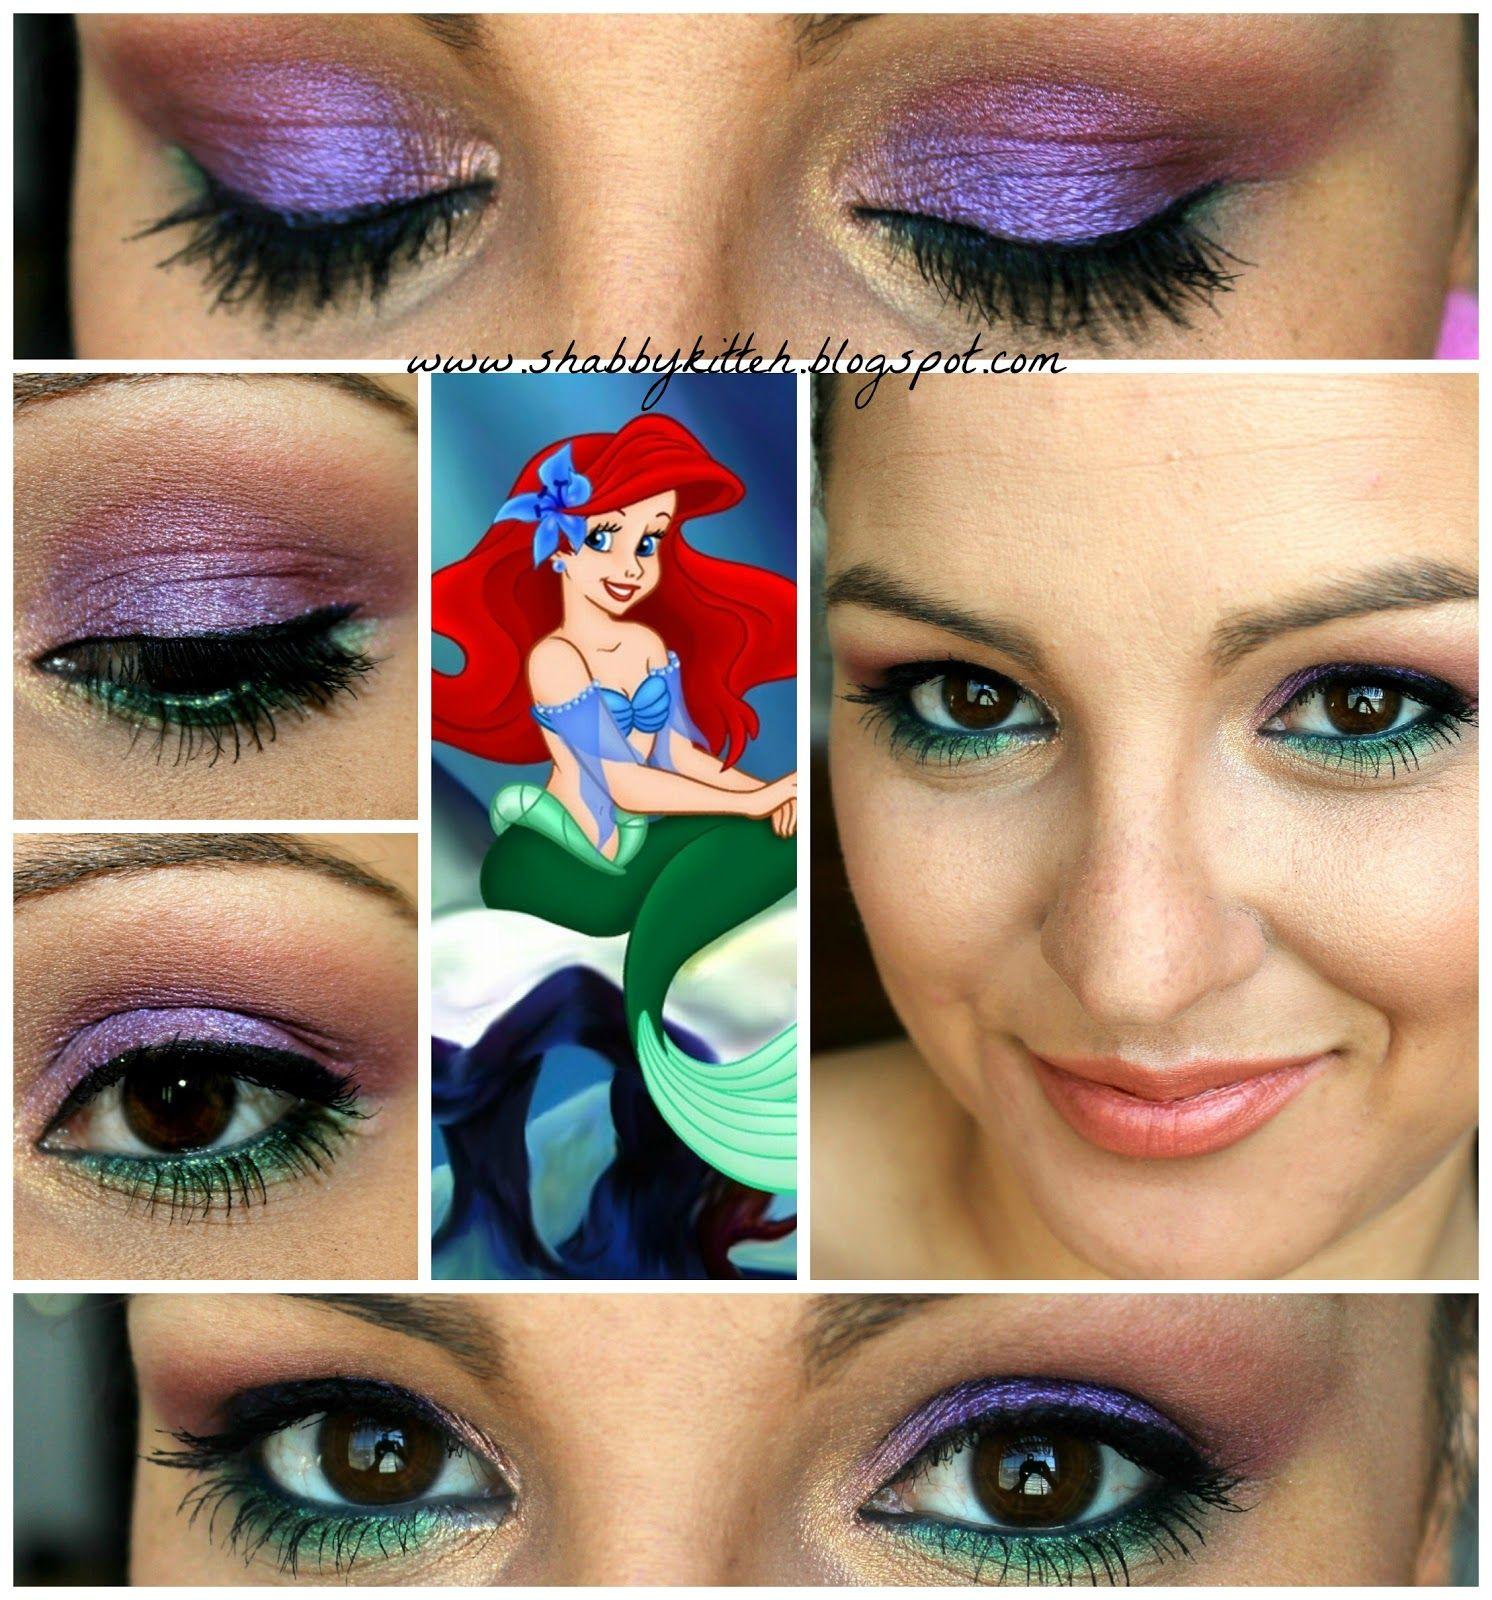 Kiss Makeup Looks: Disney Little Mermaid Makeup Tutorials, How To Beauty